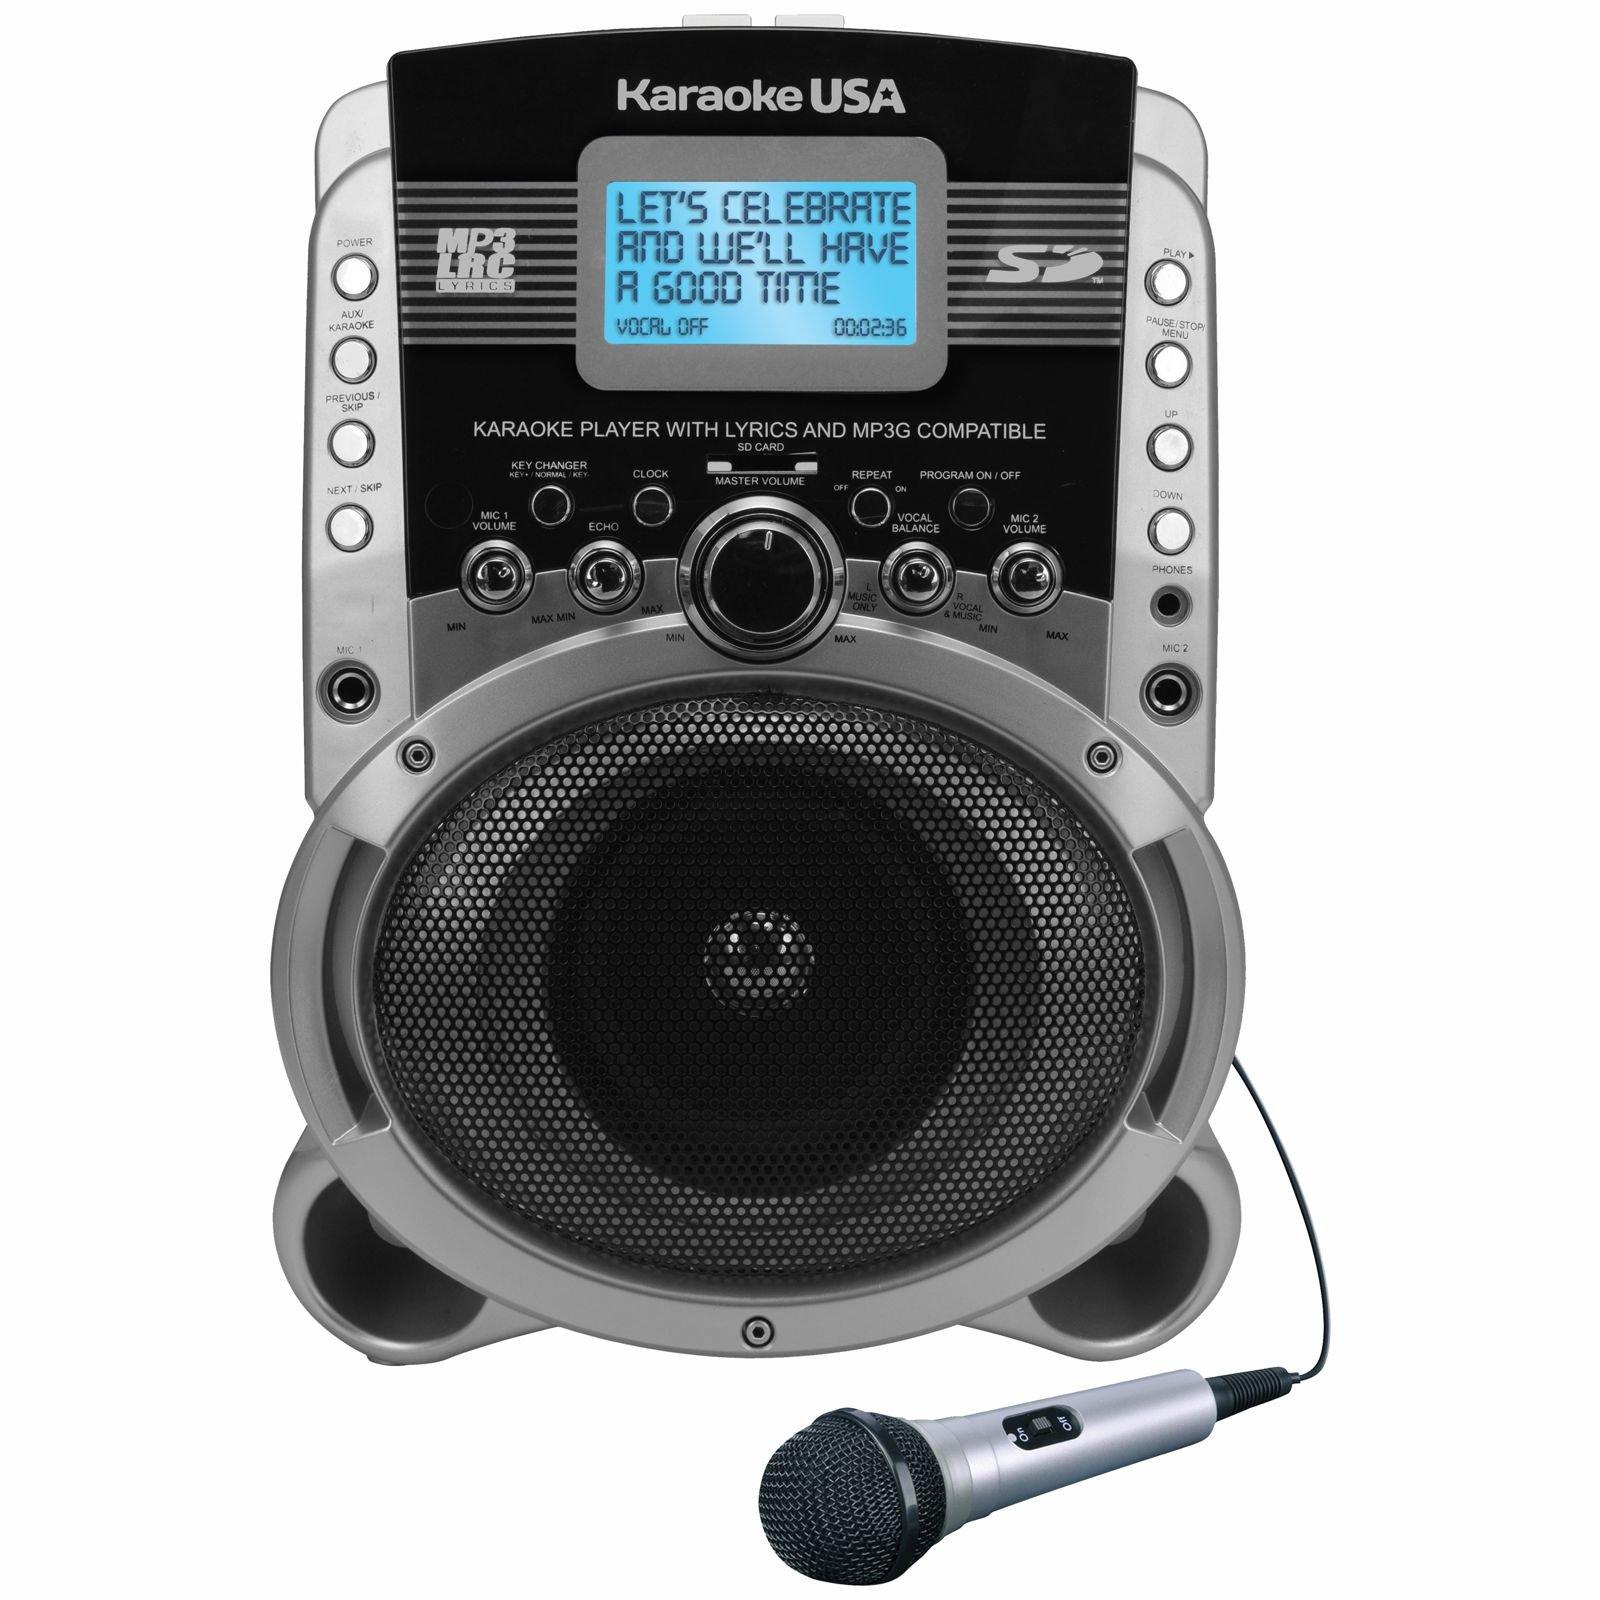 Karaoke USA A- A-B Box (SD519) by Karaoke USA (Image #1)